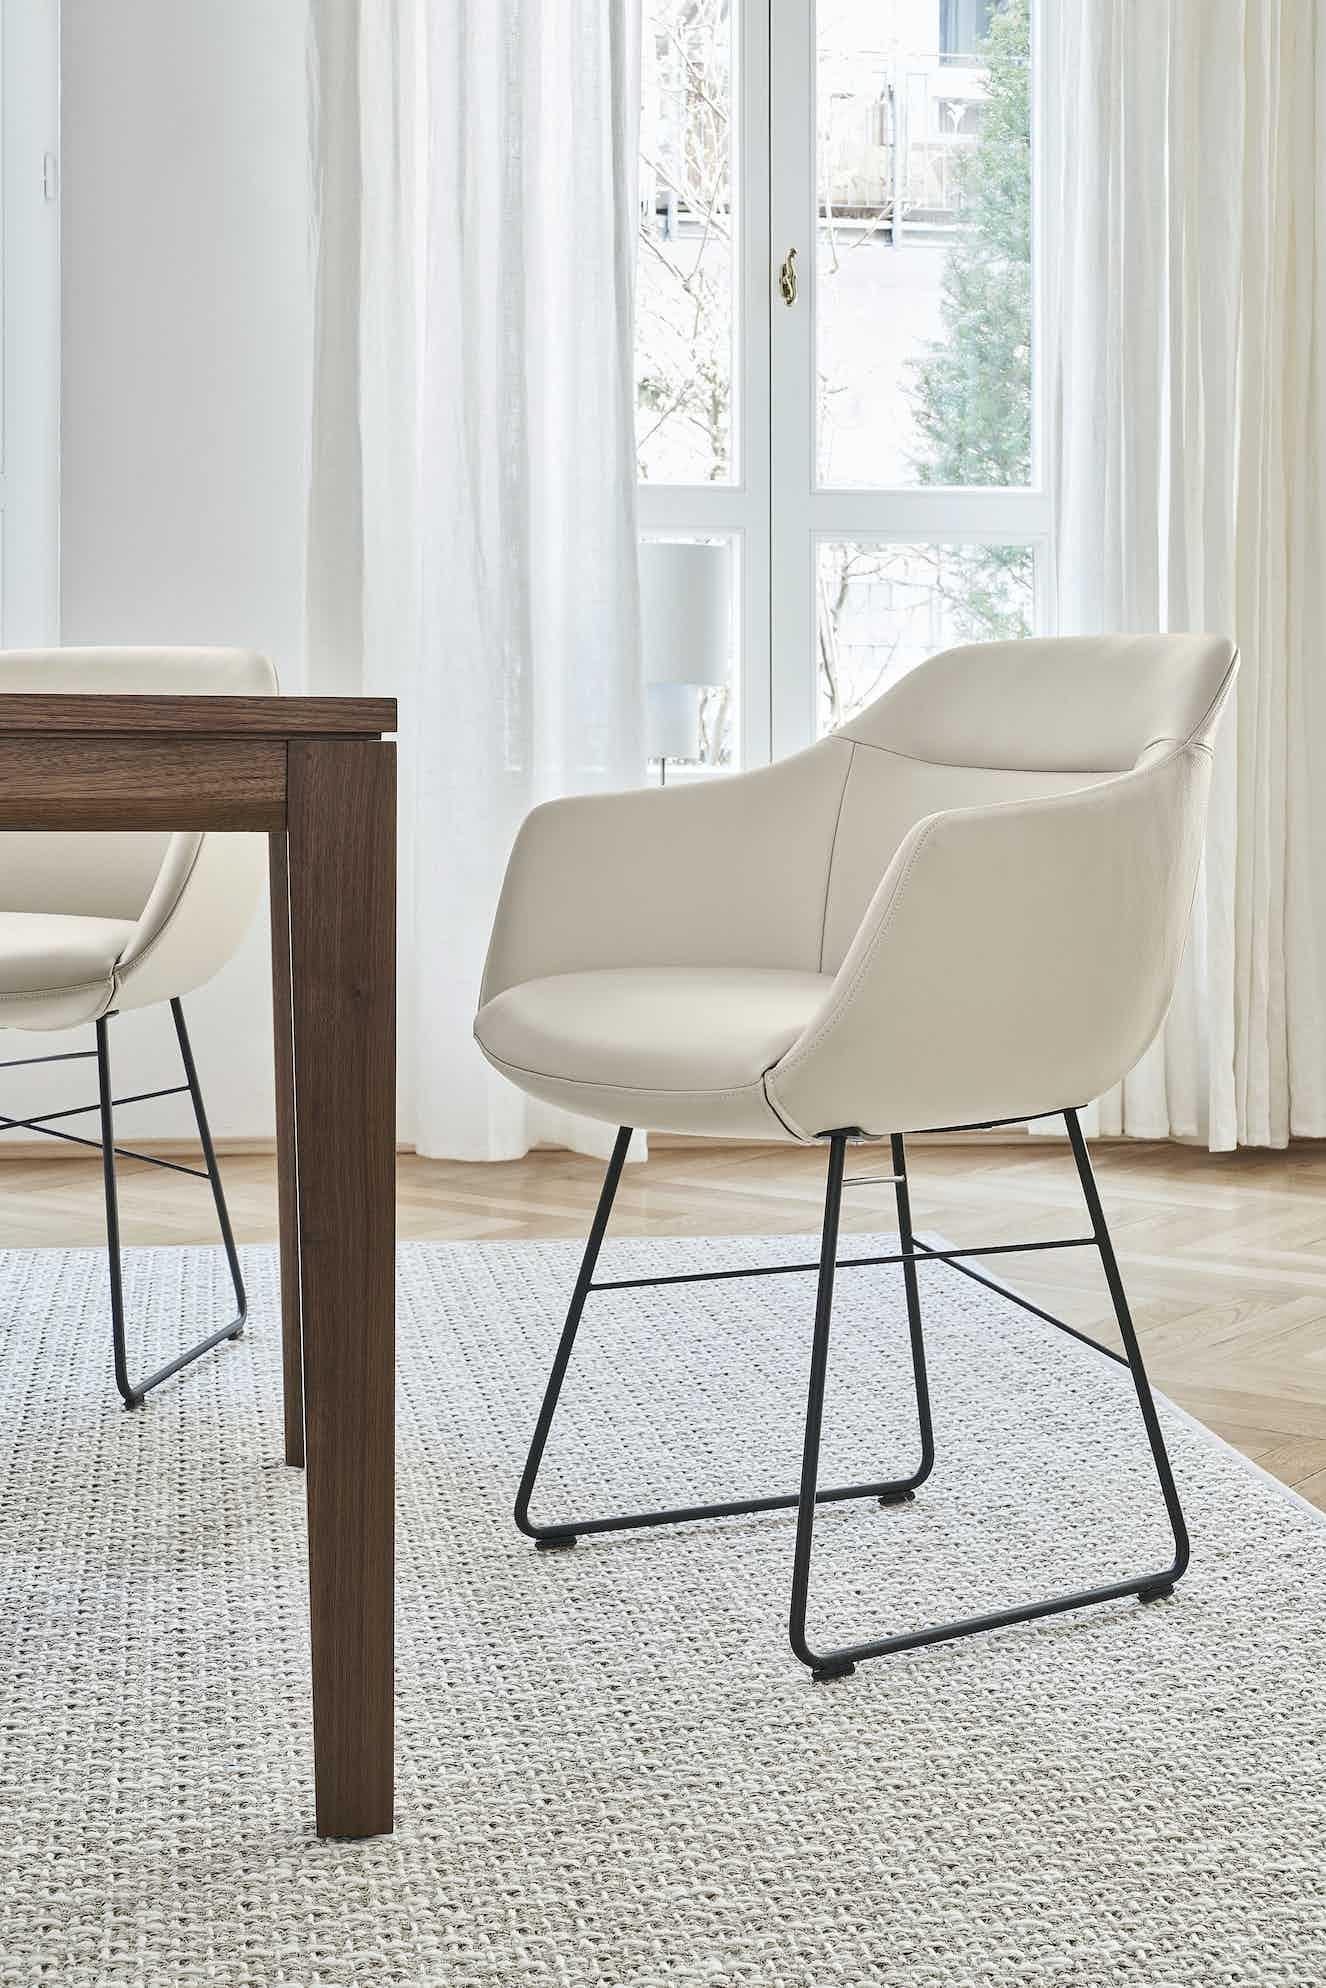 Jab Anstoetz Cara Dining Chair Angle Haute Living